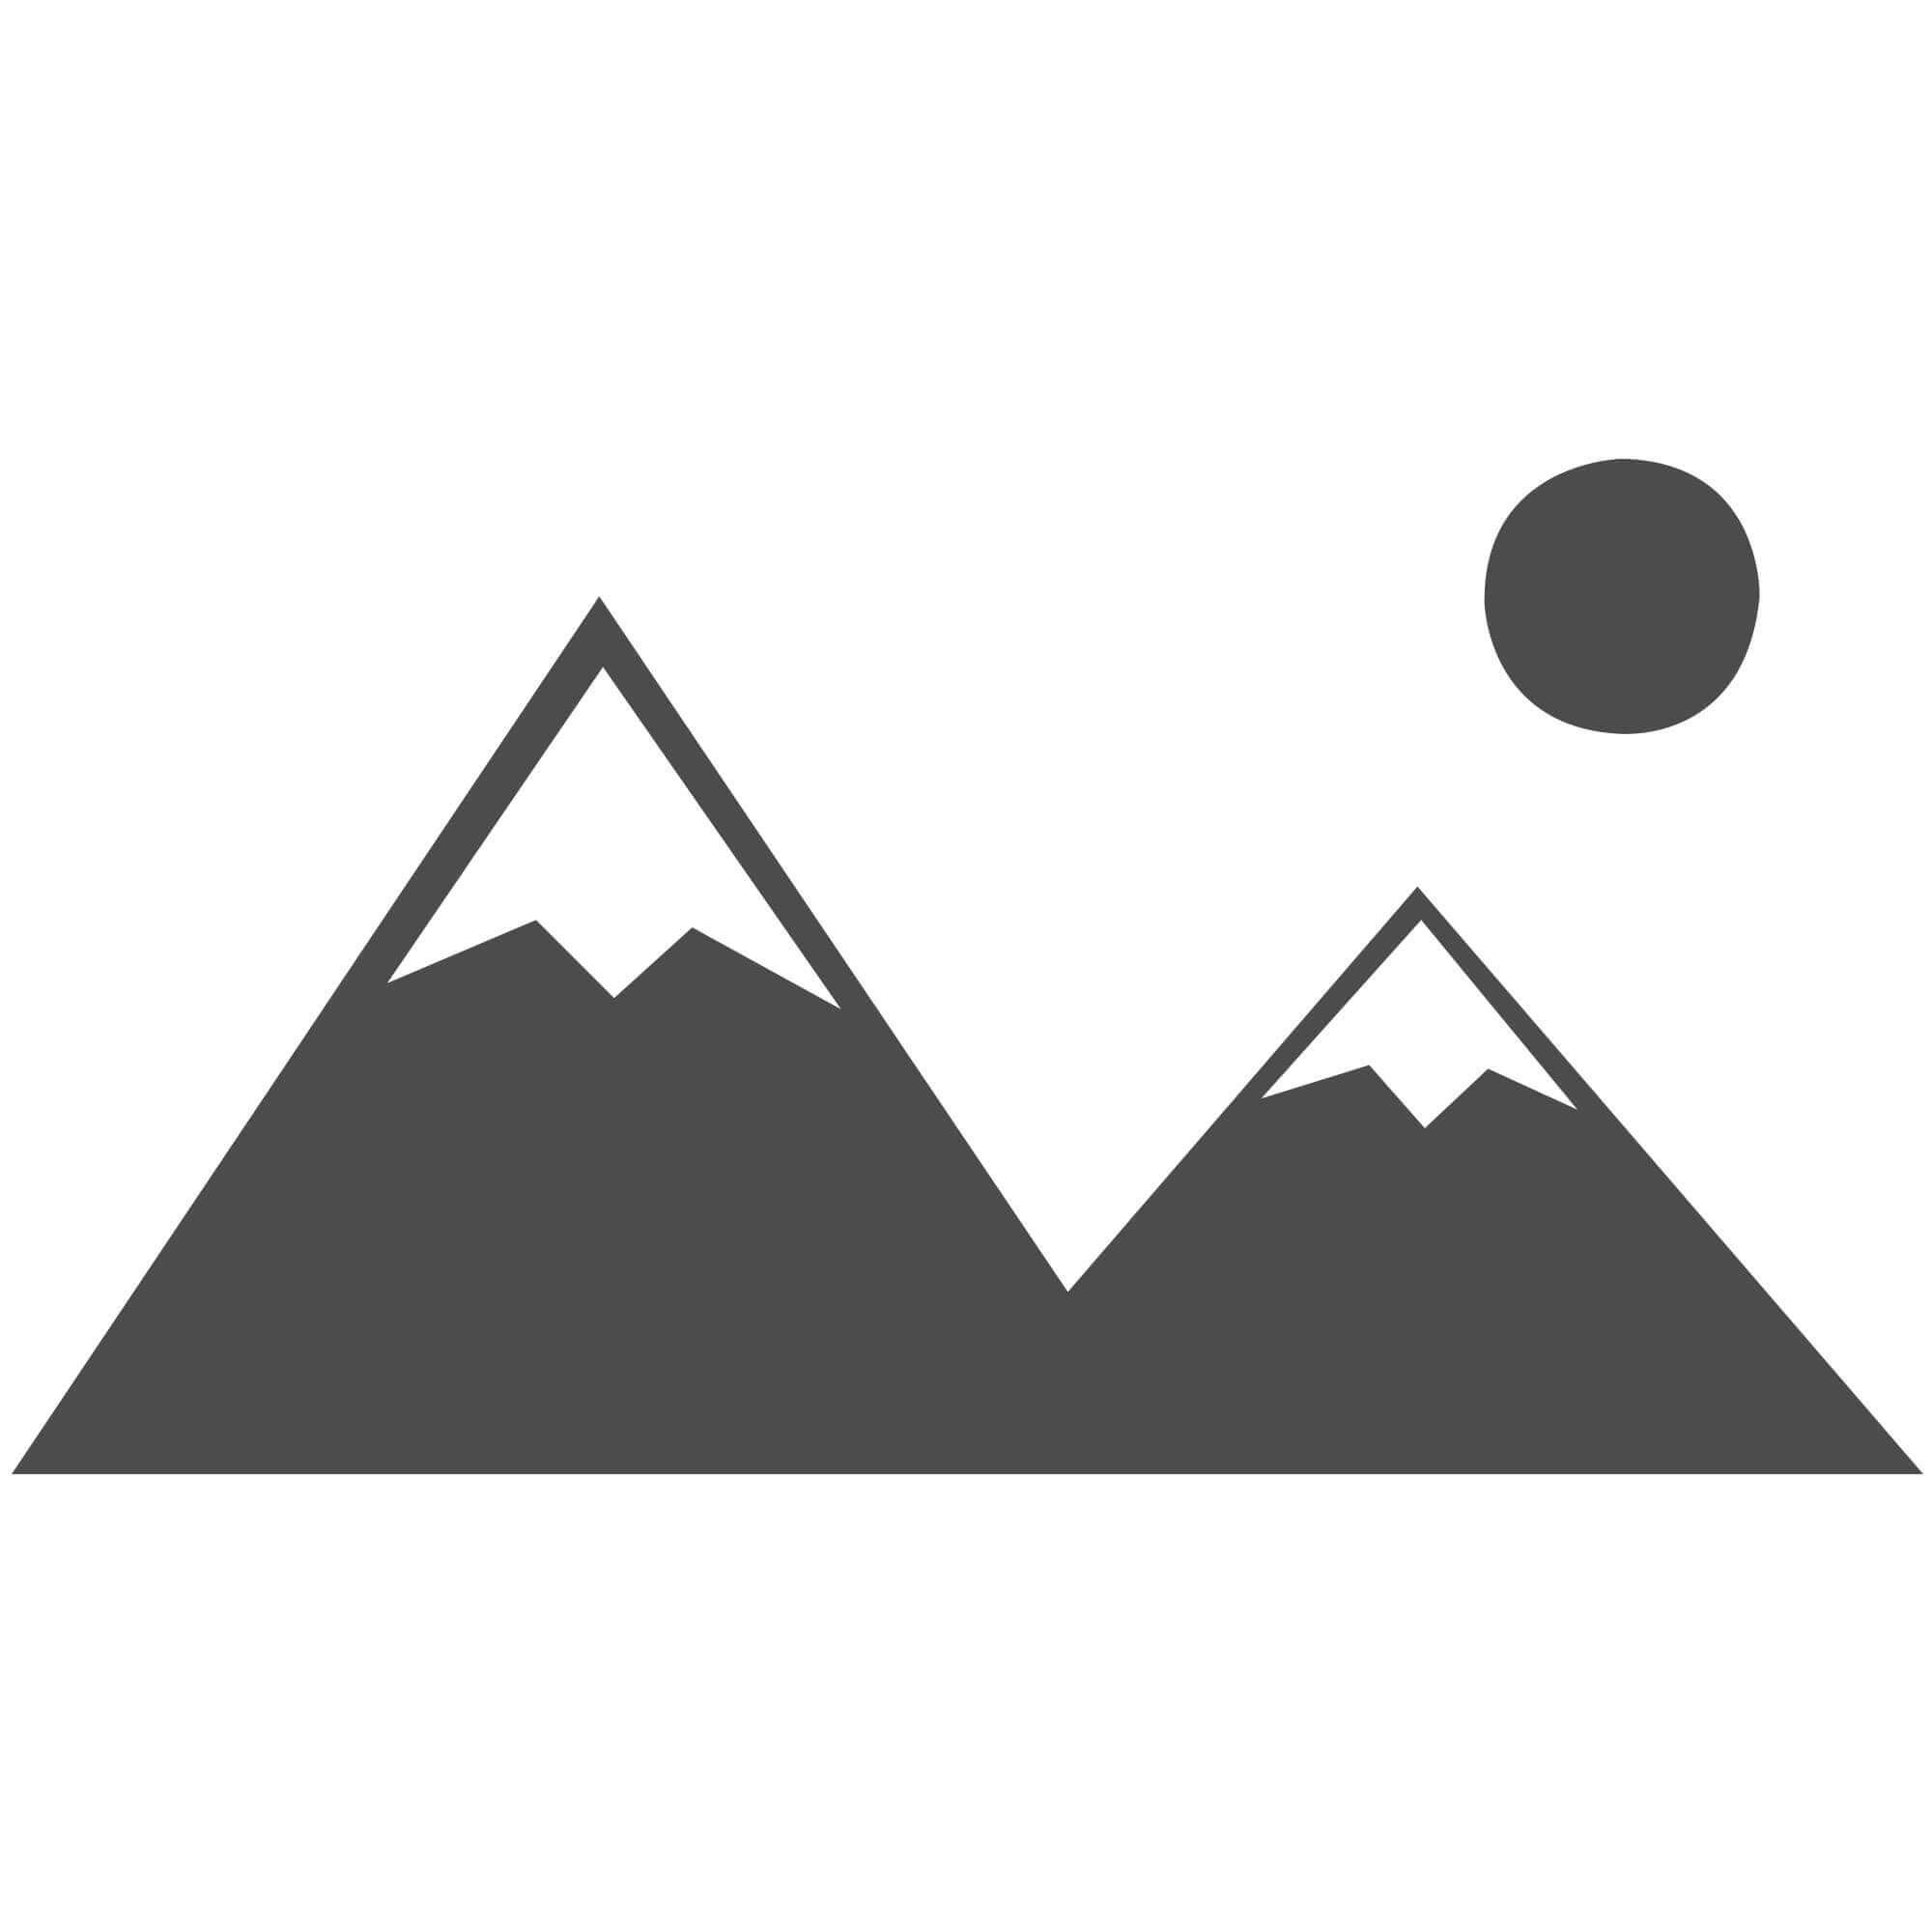 "Harmony Shaggy Rug - Red-200 x 285 cm (6'7"" x 9'4"")"